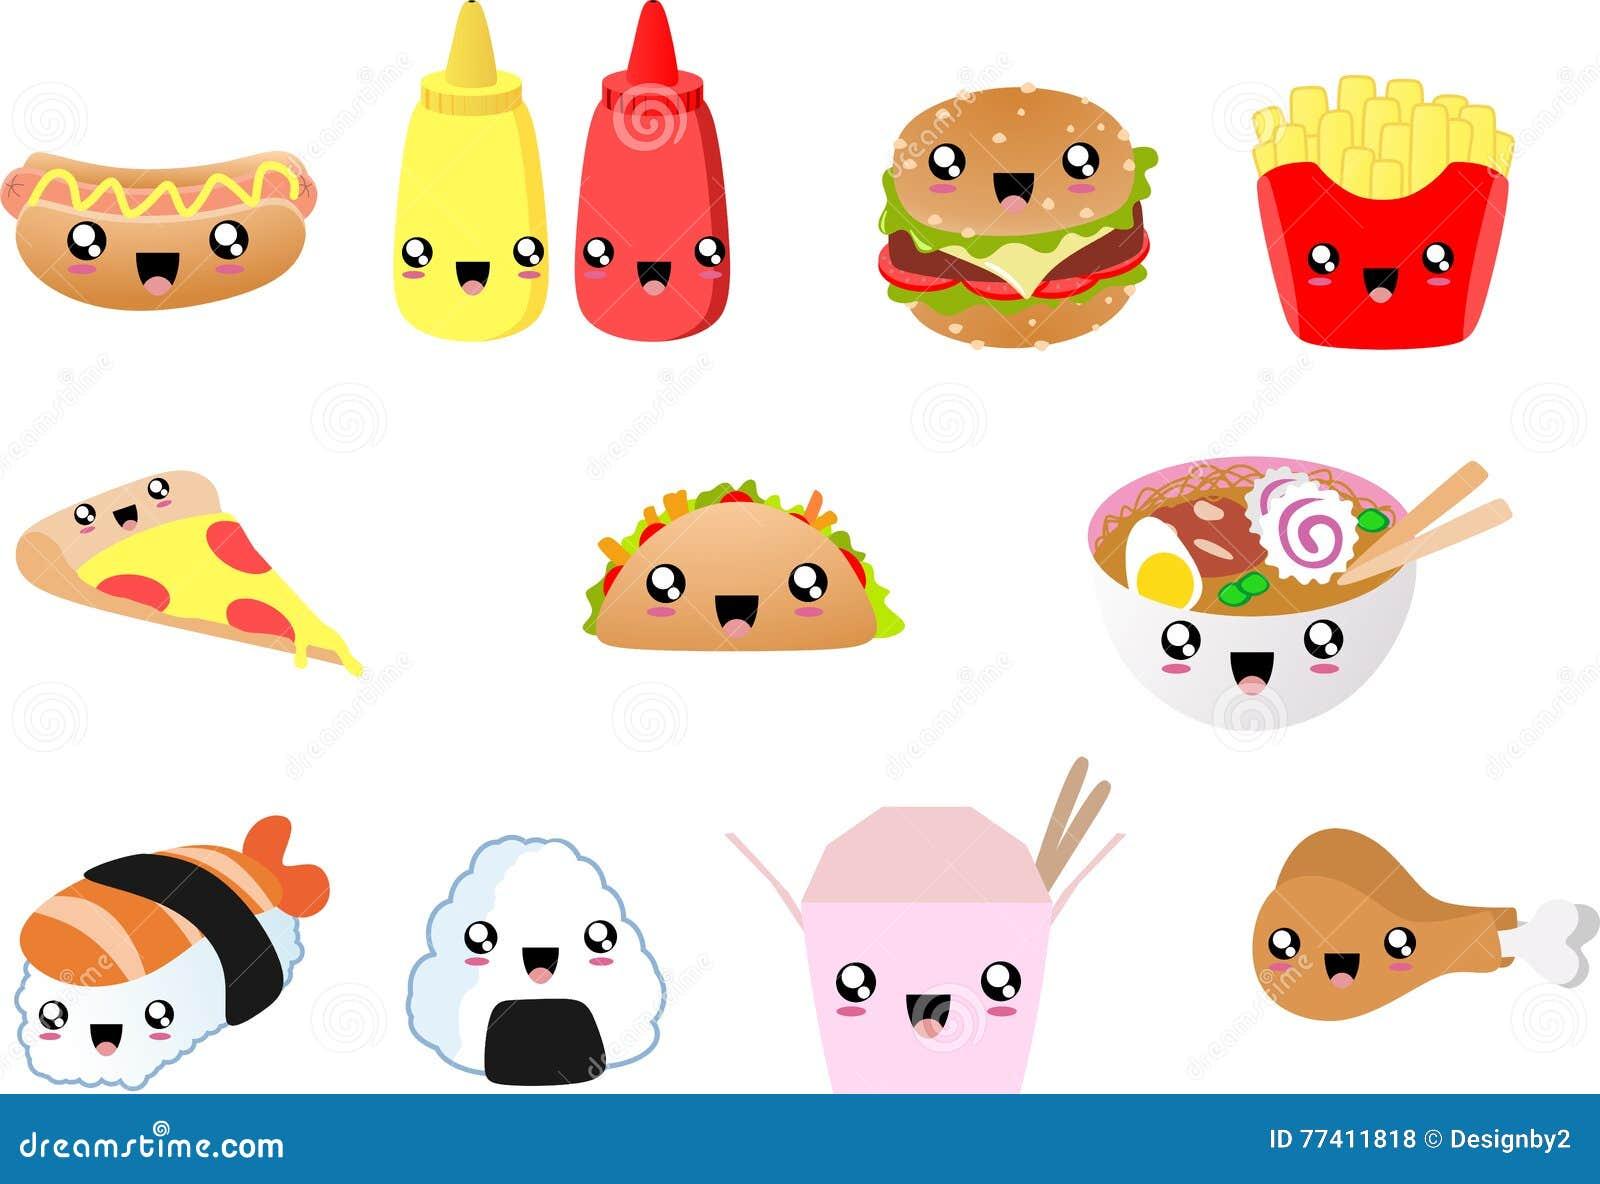 Wall Sticker Words Fast Food Kawaii Food Hot Dog Hamburguer Pizza Night